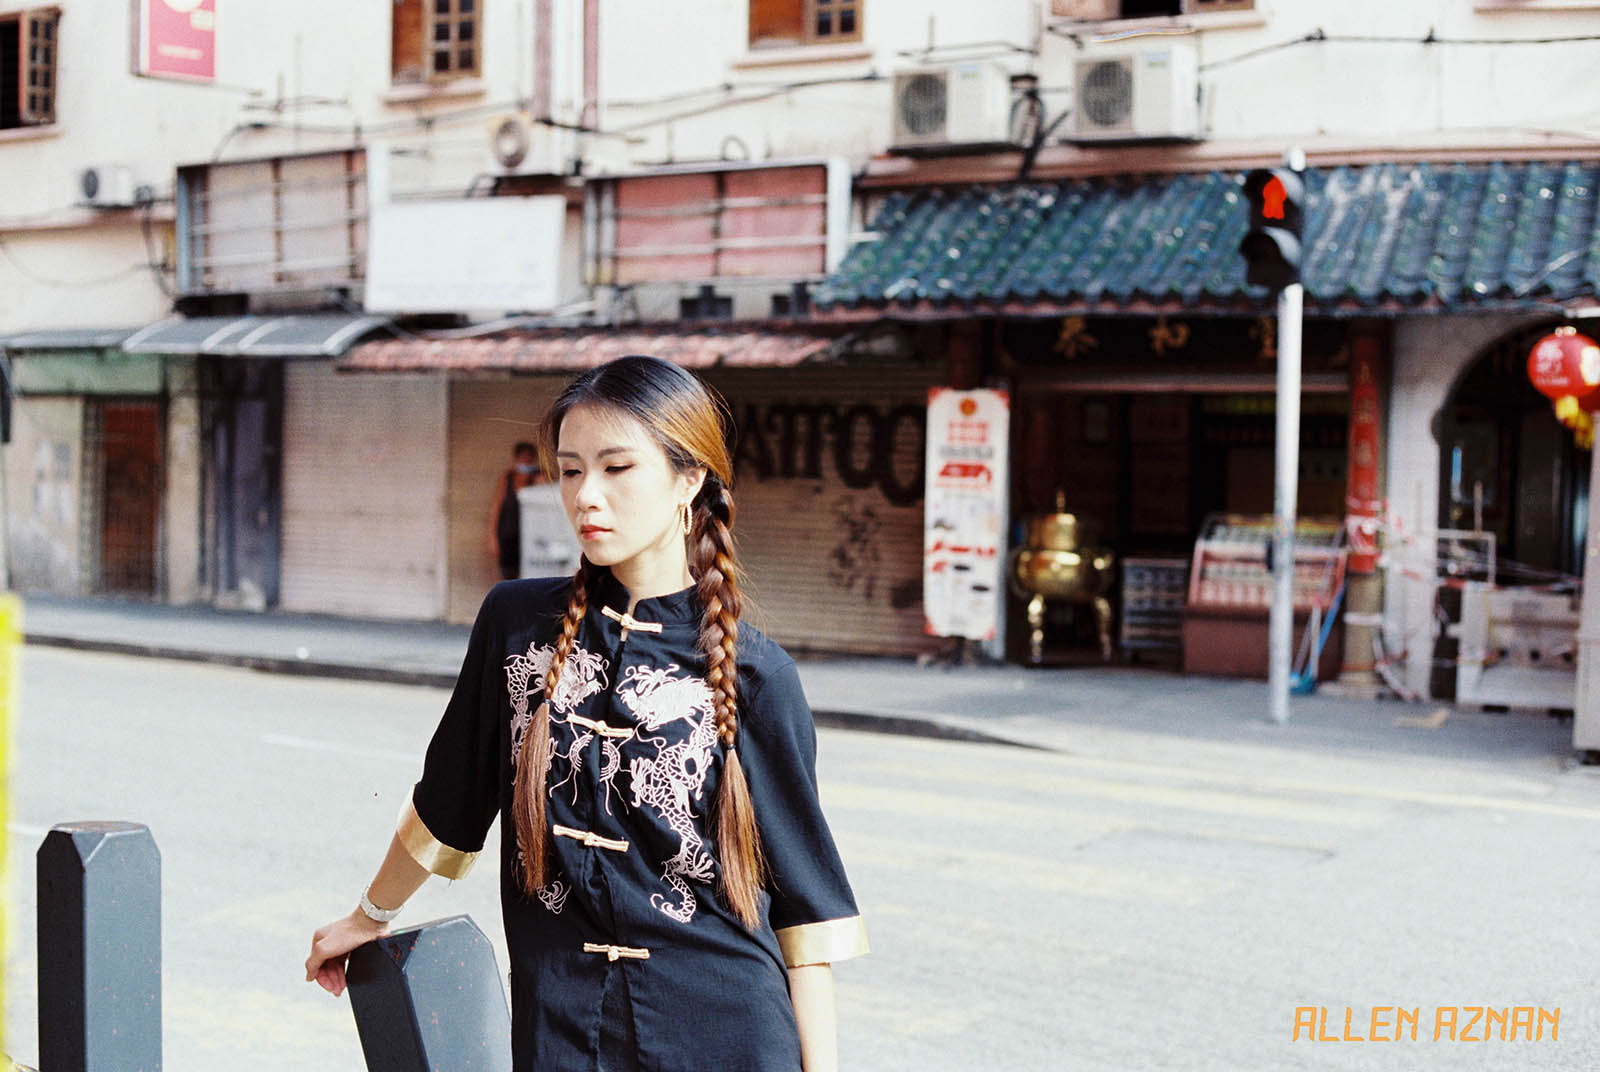 Carmen Ng | Chinatown Hustle (Film)